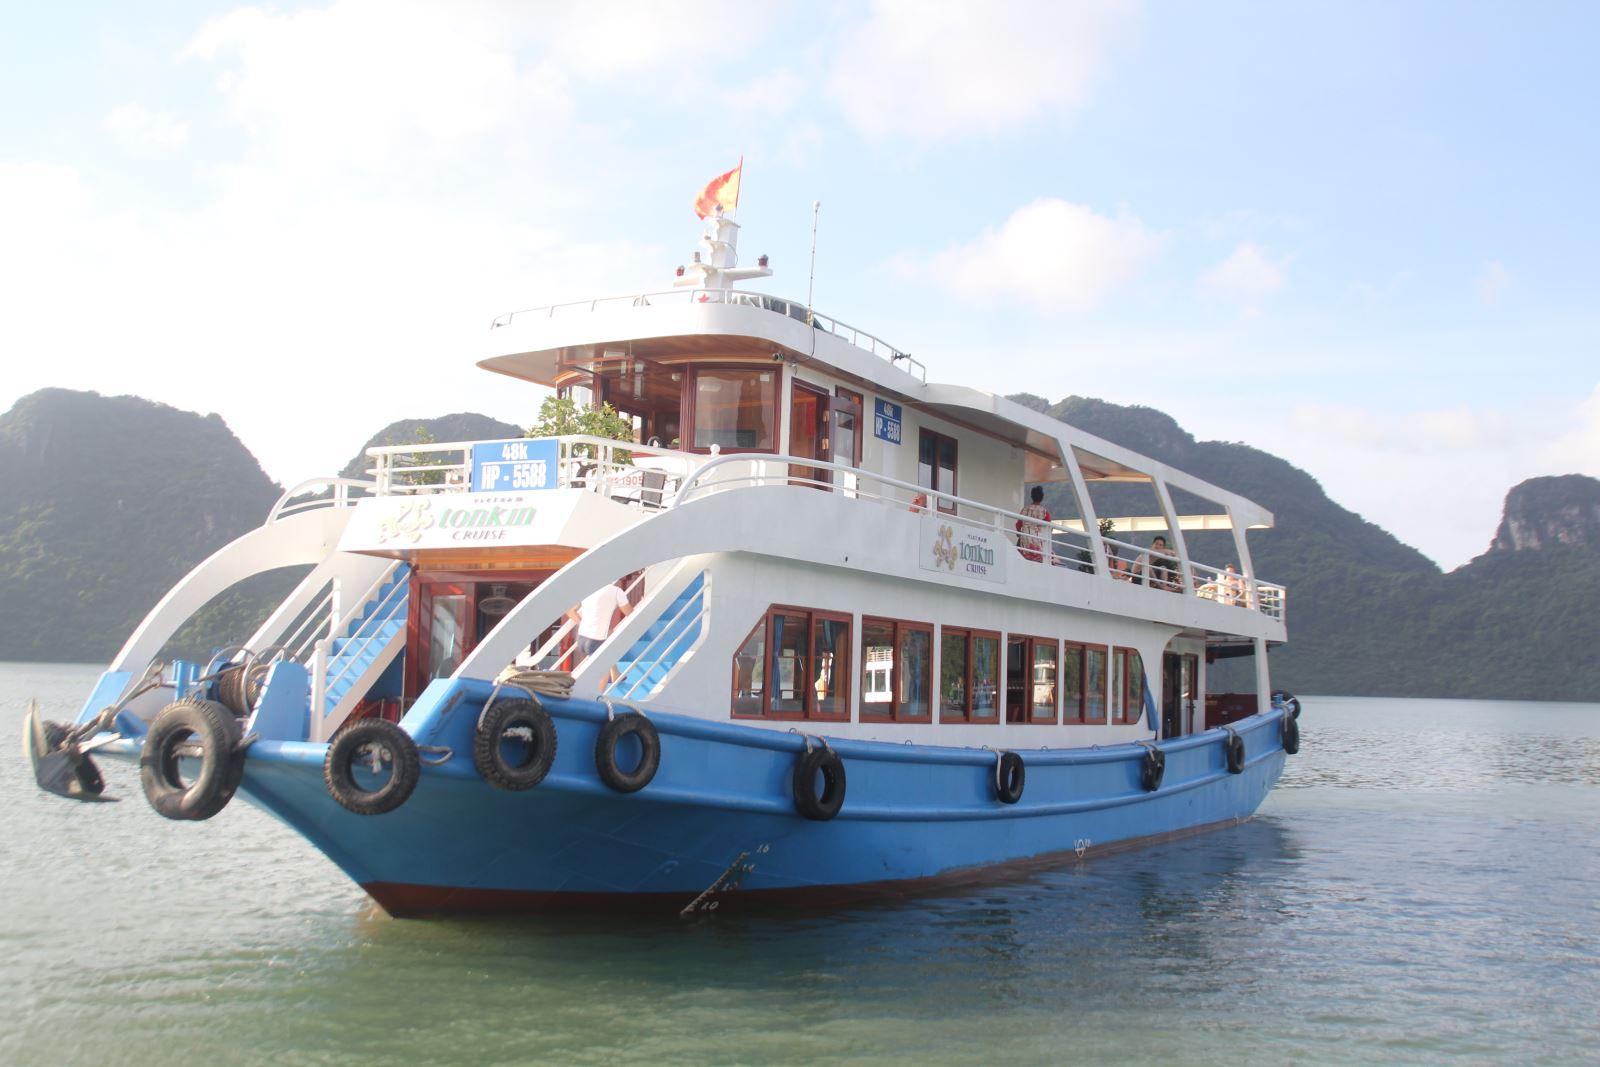 Tonkin Budget Day Cruise in Lan Ha Bay